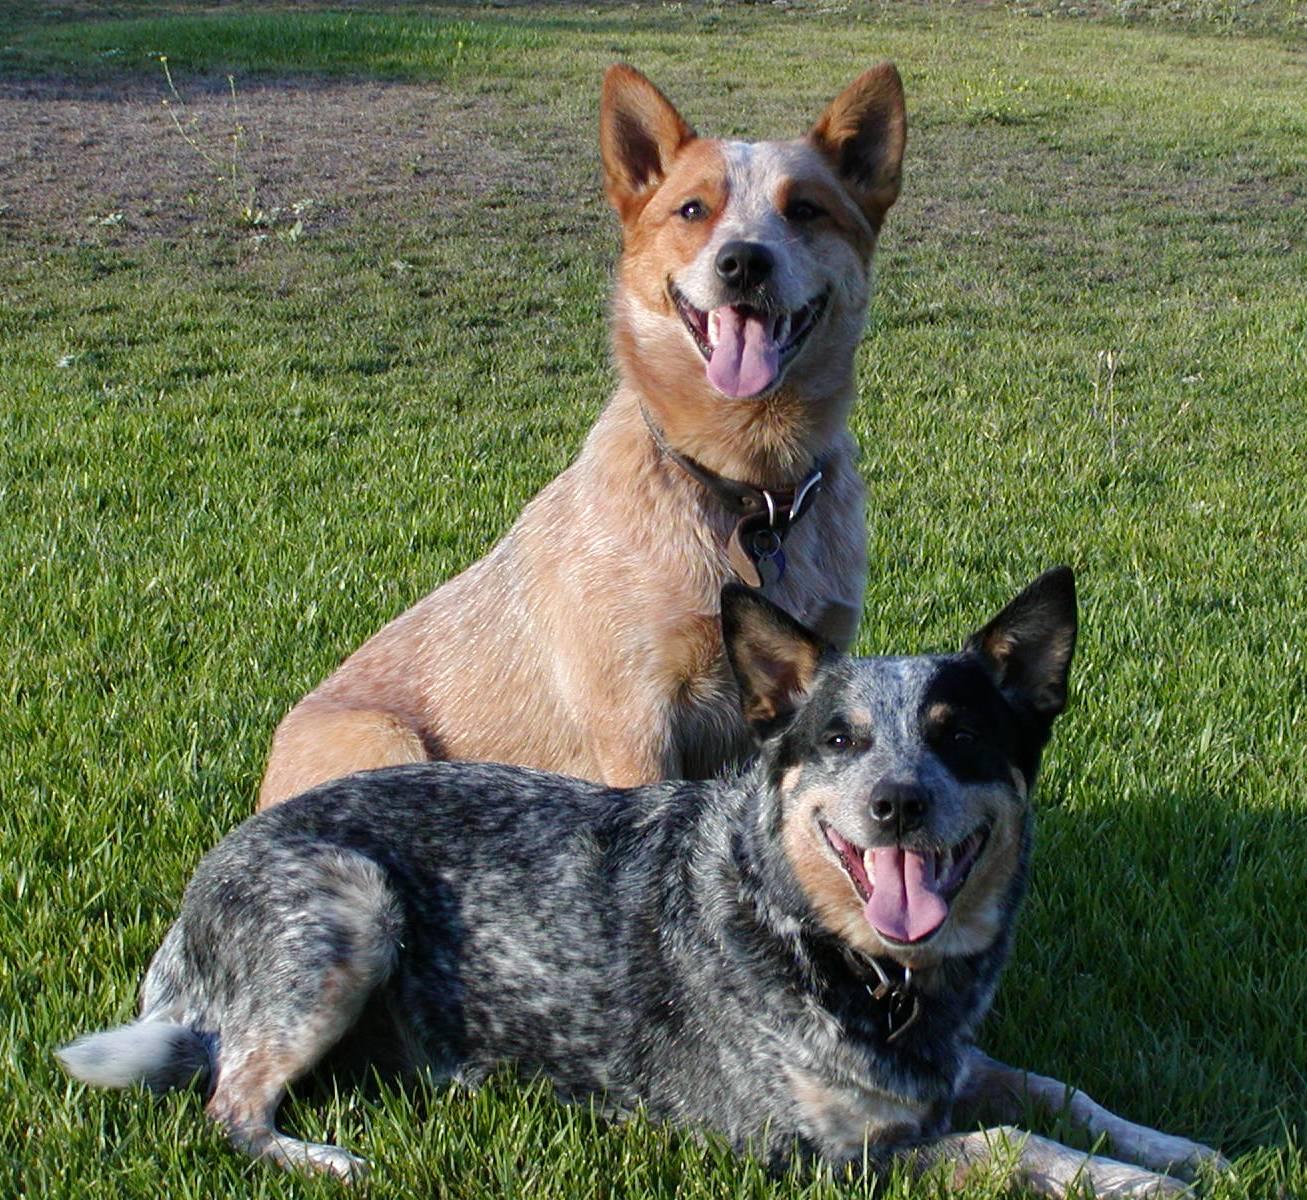 Australian Cattle Dog on Pinterest | 52 Pins